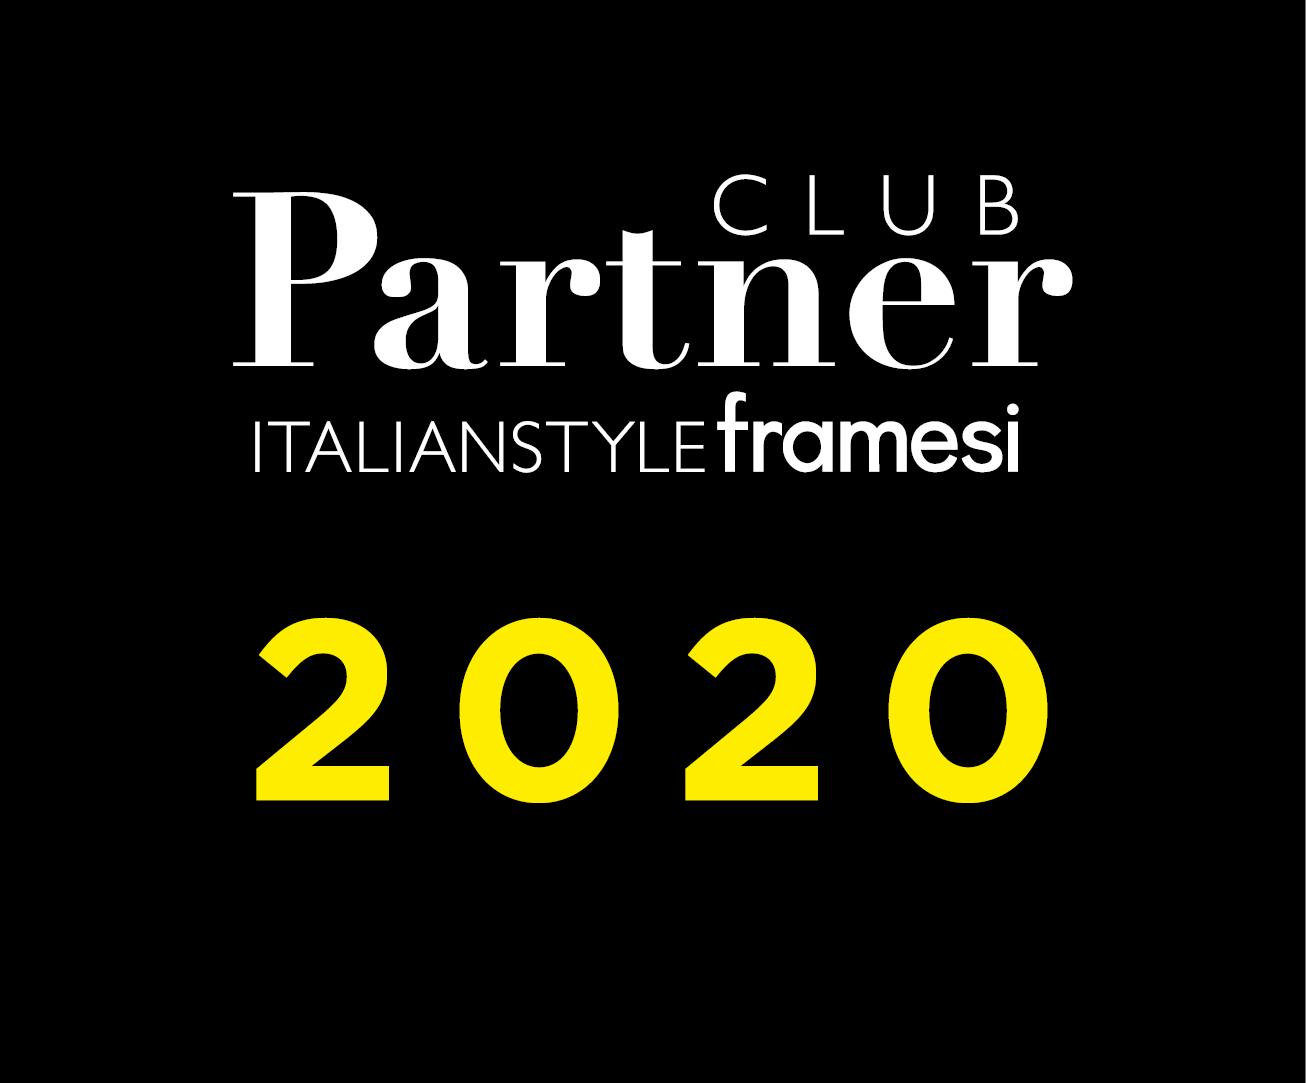 partner club framesi